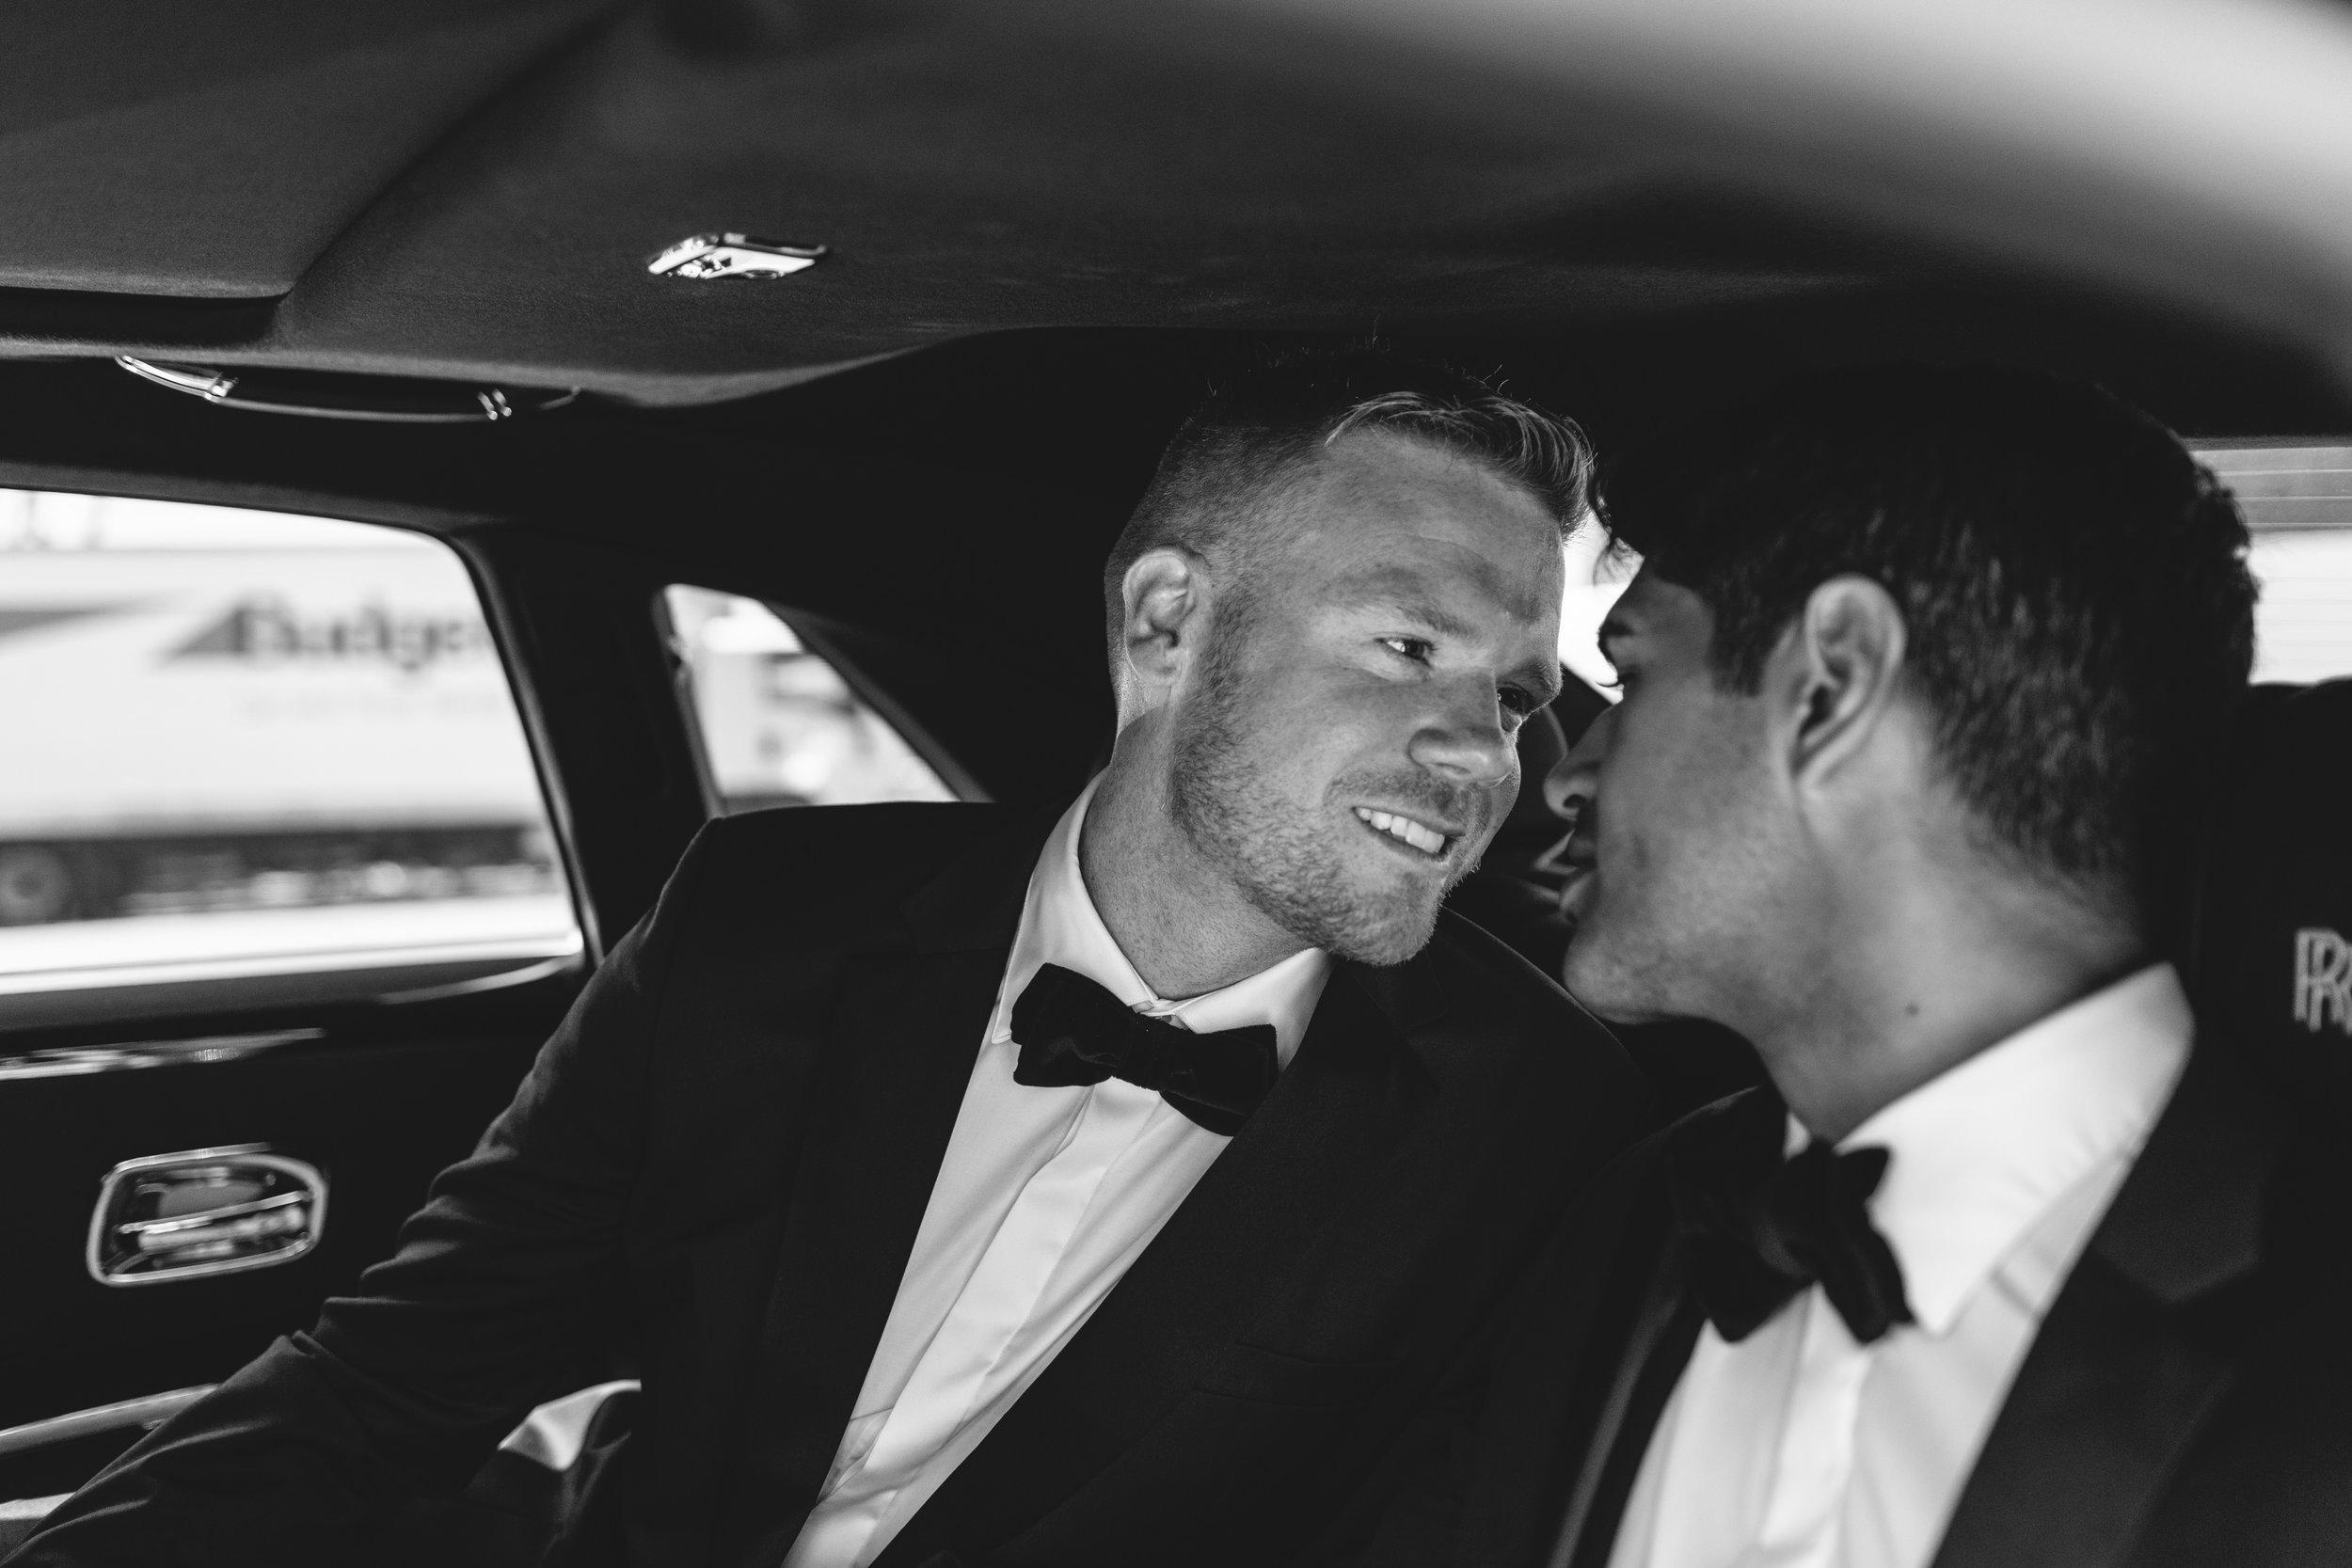 Stephen&David-Wedding-75.jpg